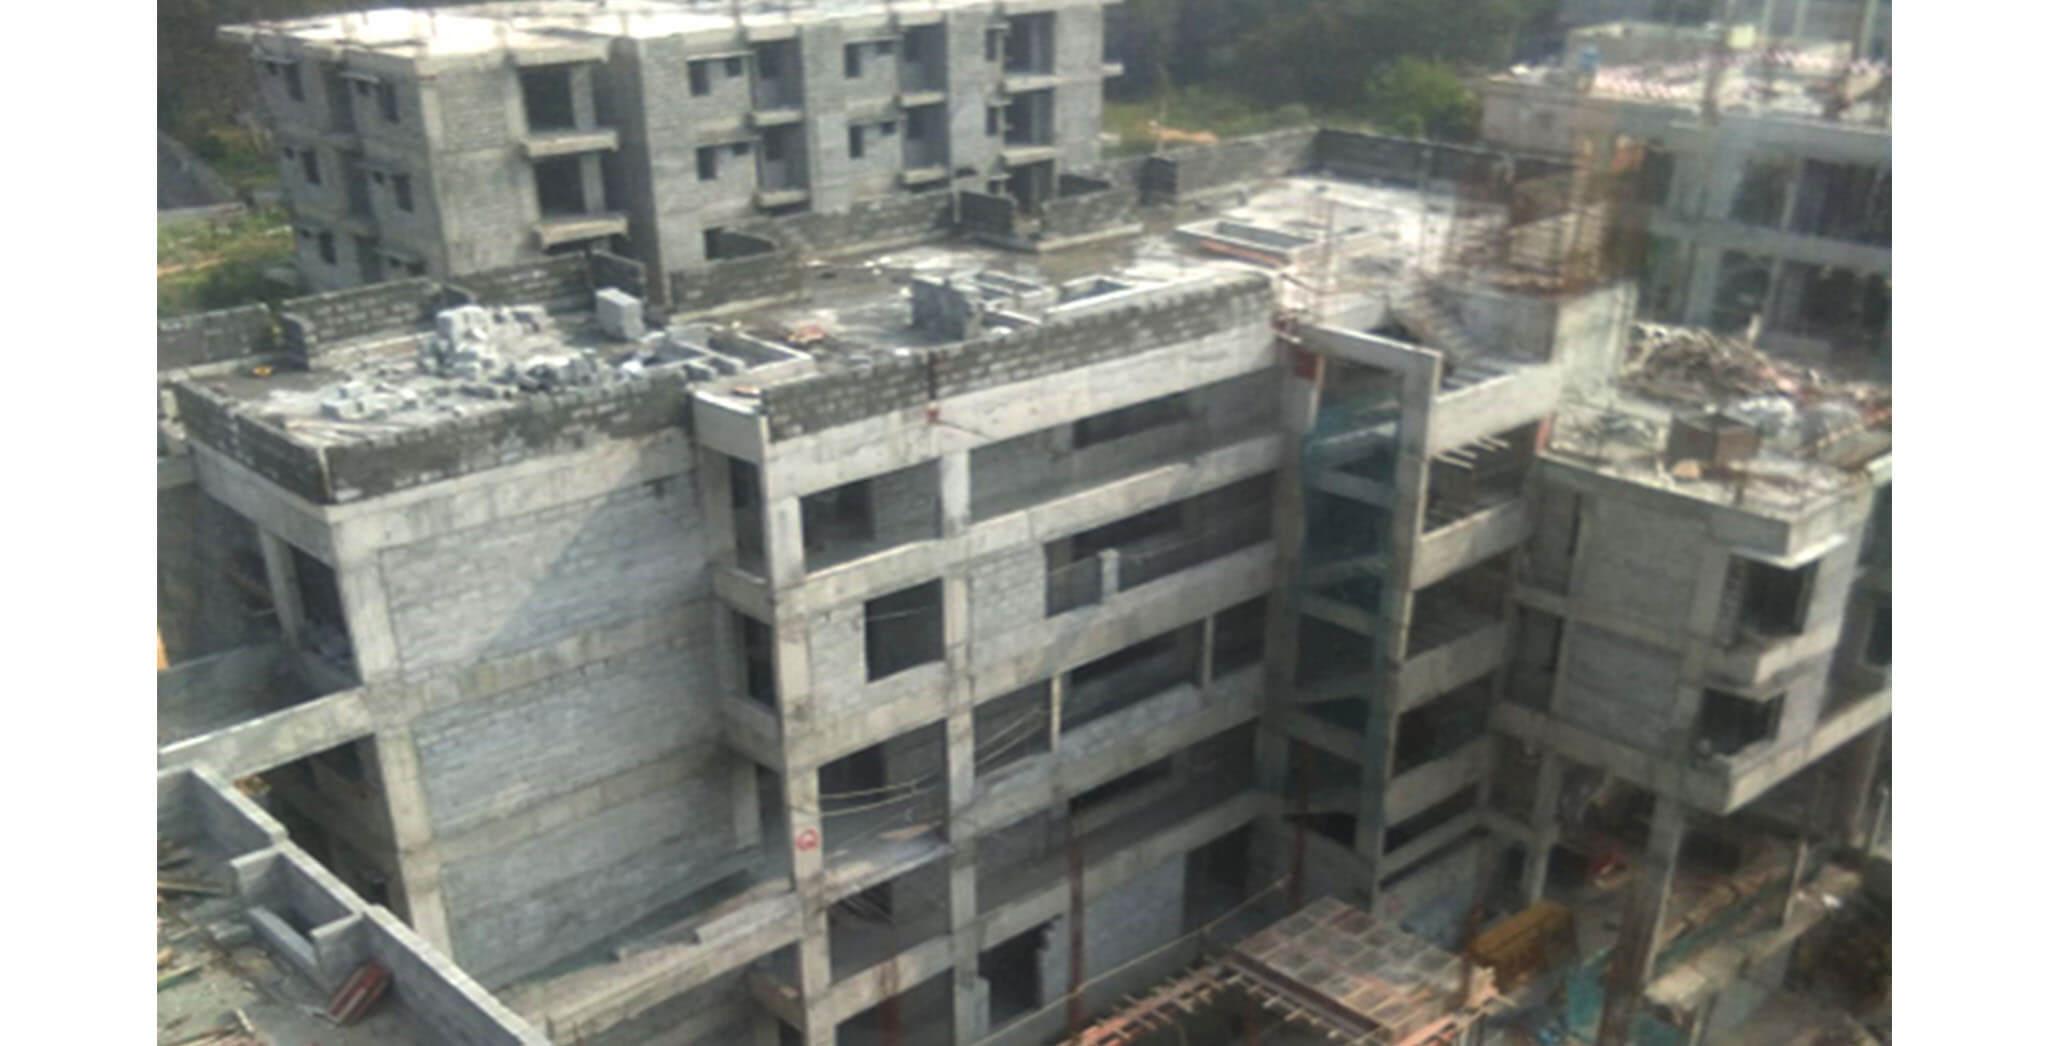 Oct 2020 - North side view: Q Block—internal plastering work-in-progress at 3rd floor level; Above terrace work-in-progress